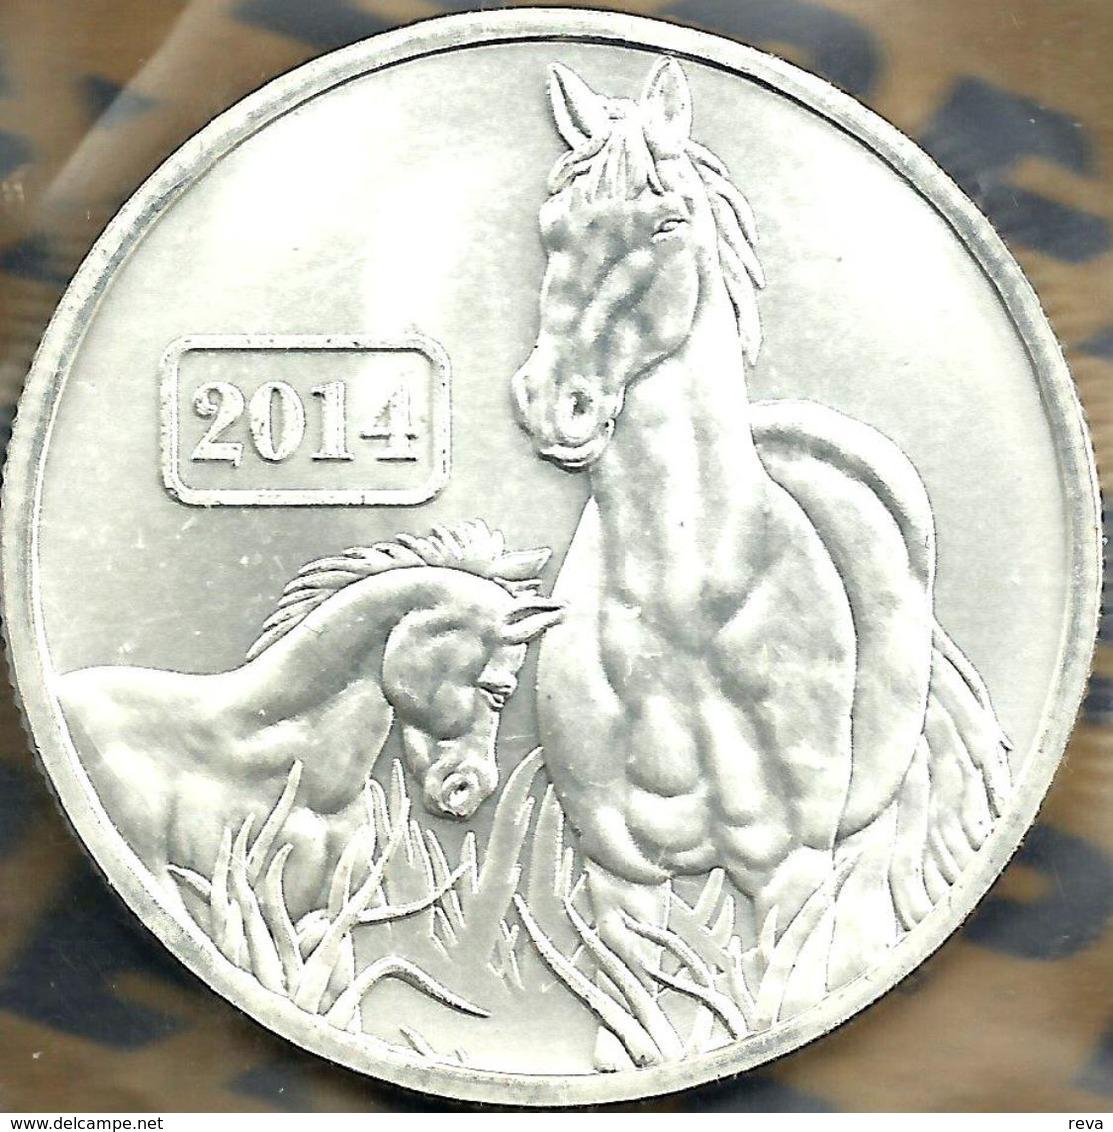 TOKELAU $5 YEAR OF THE HORSE CHINESE ZODIAC FRONT QEII BACK 2014 AG SILVER 1Oz UNC KM? READ DESCRIPTION CAREFULLY !!! - Monnaies